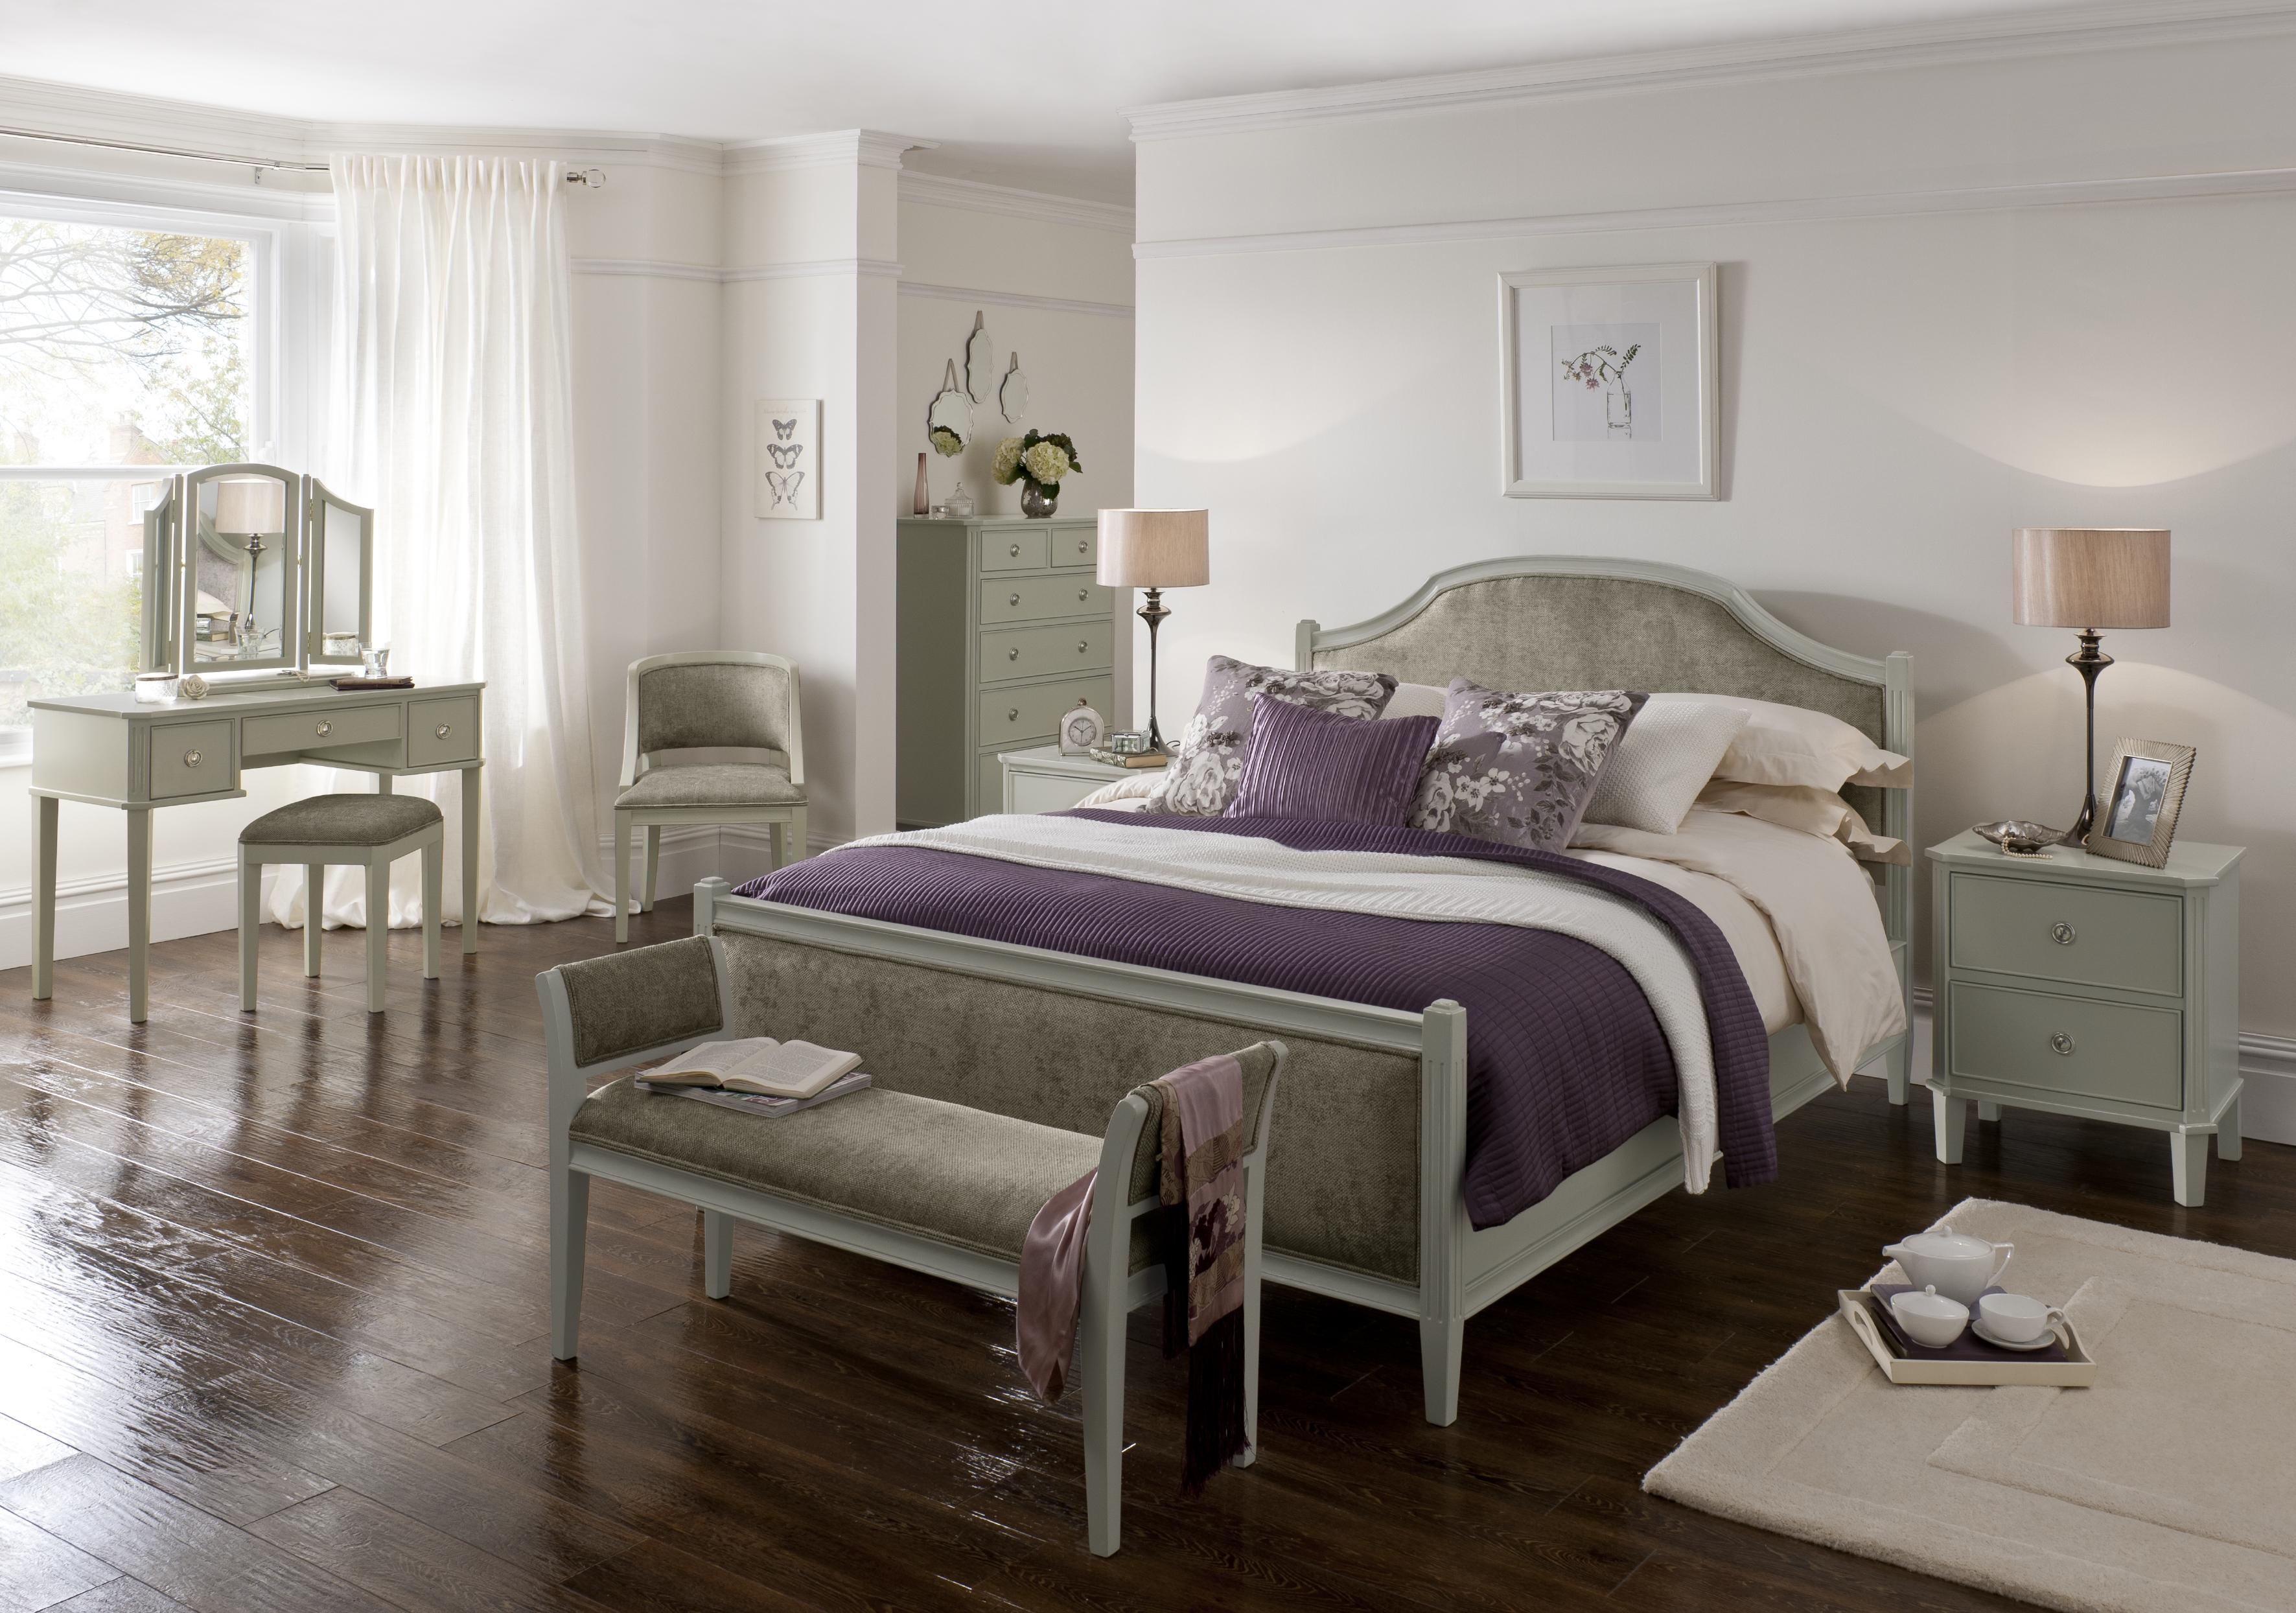 Painted Bedroom Furniture Range